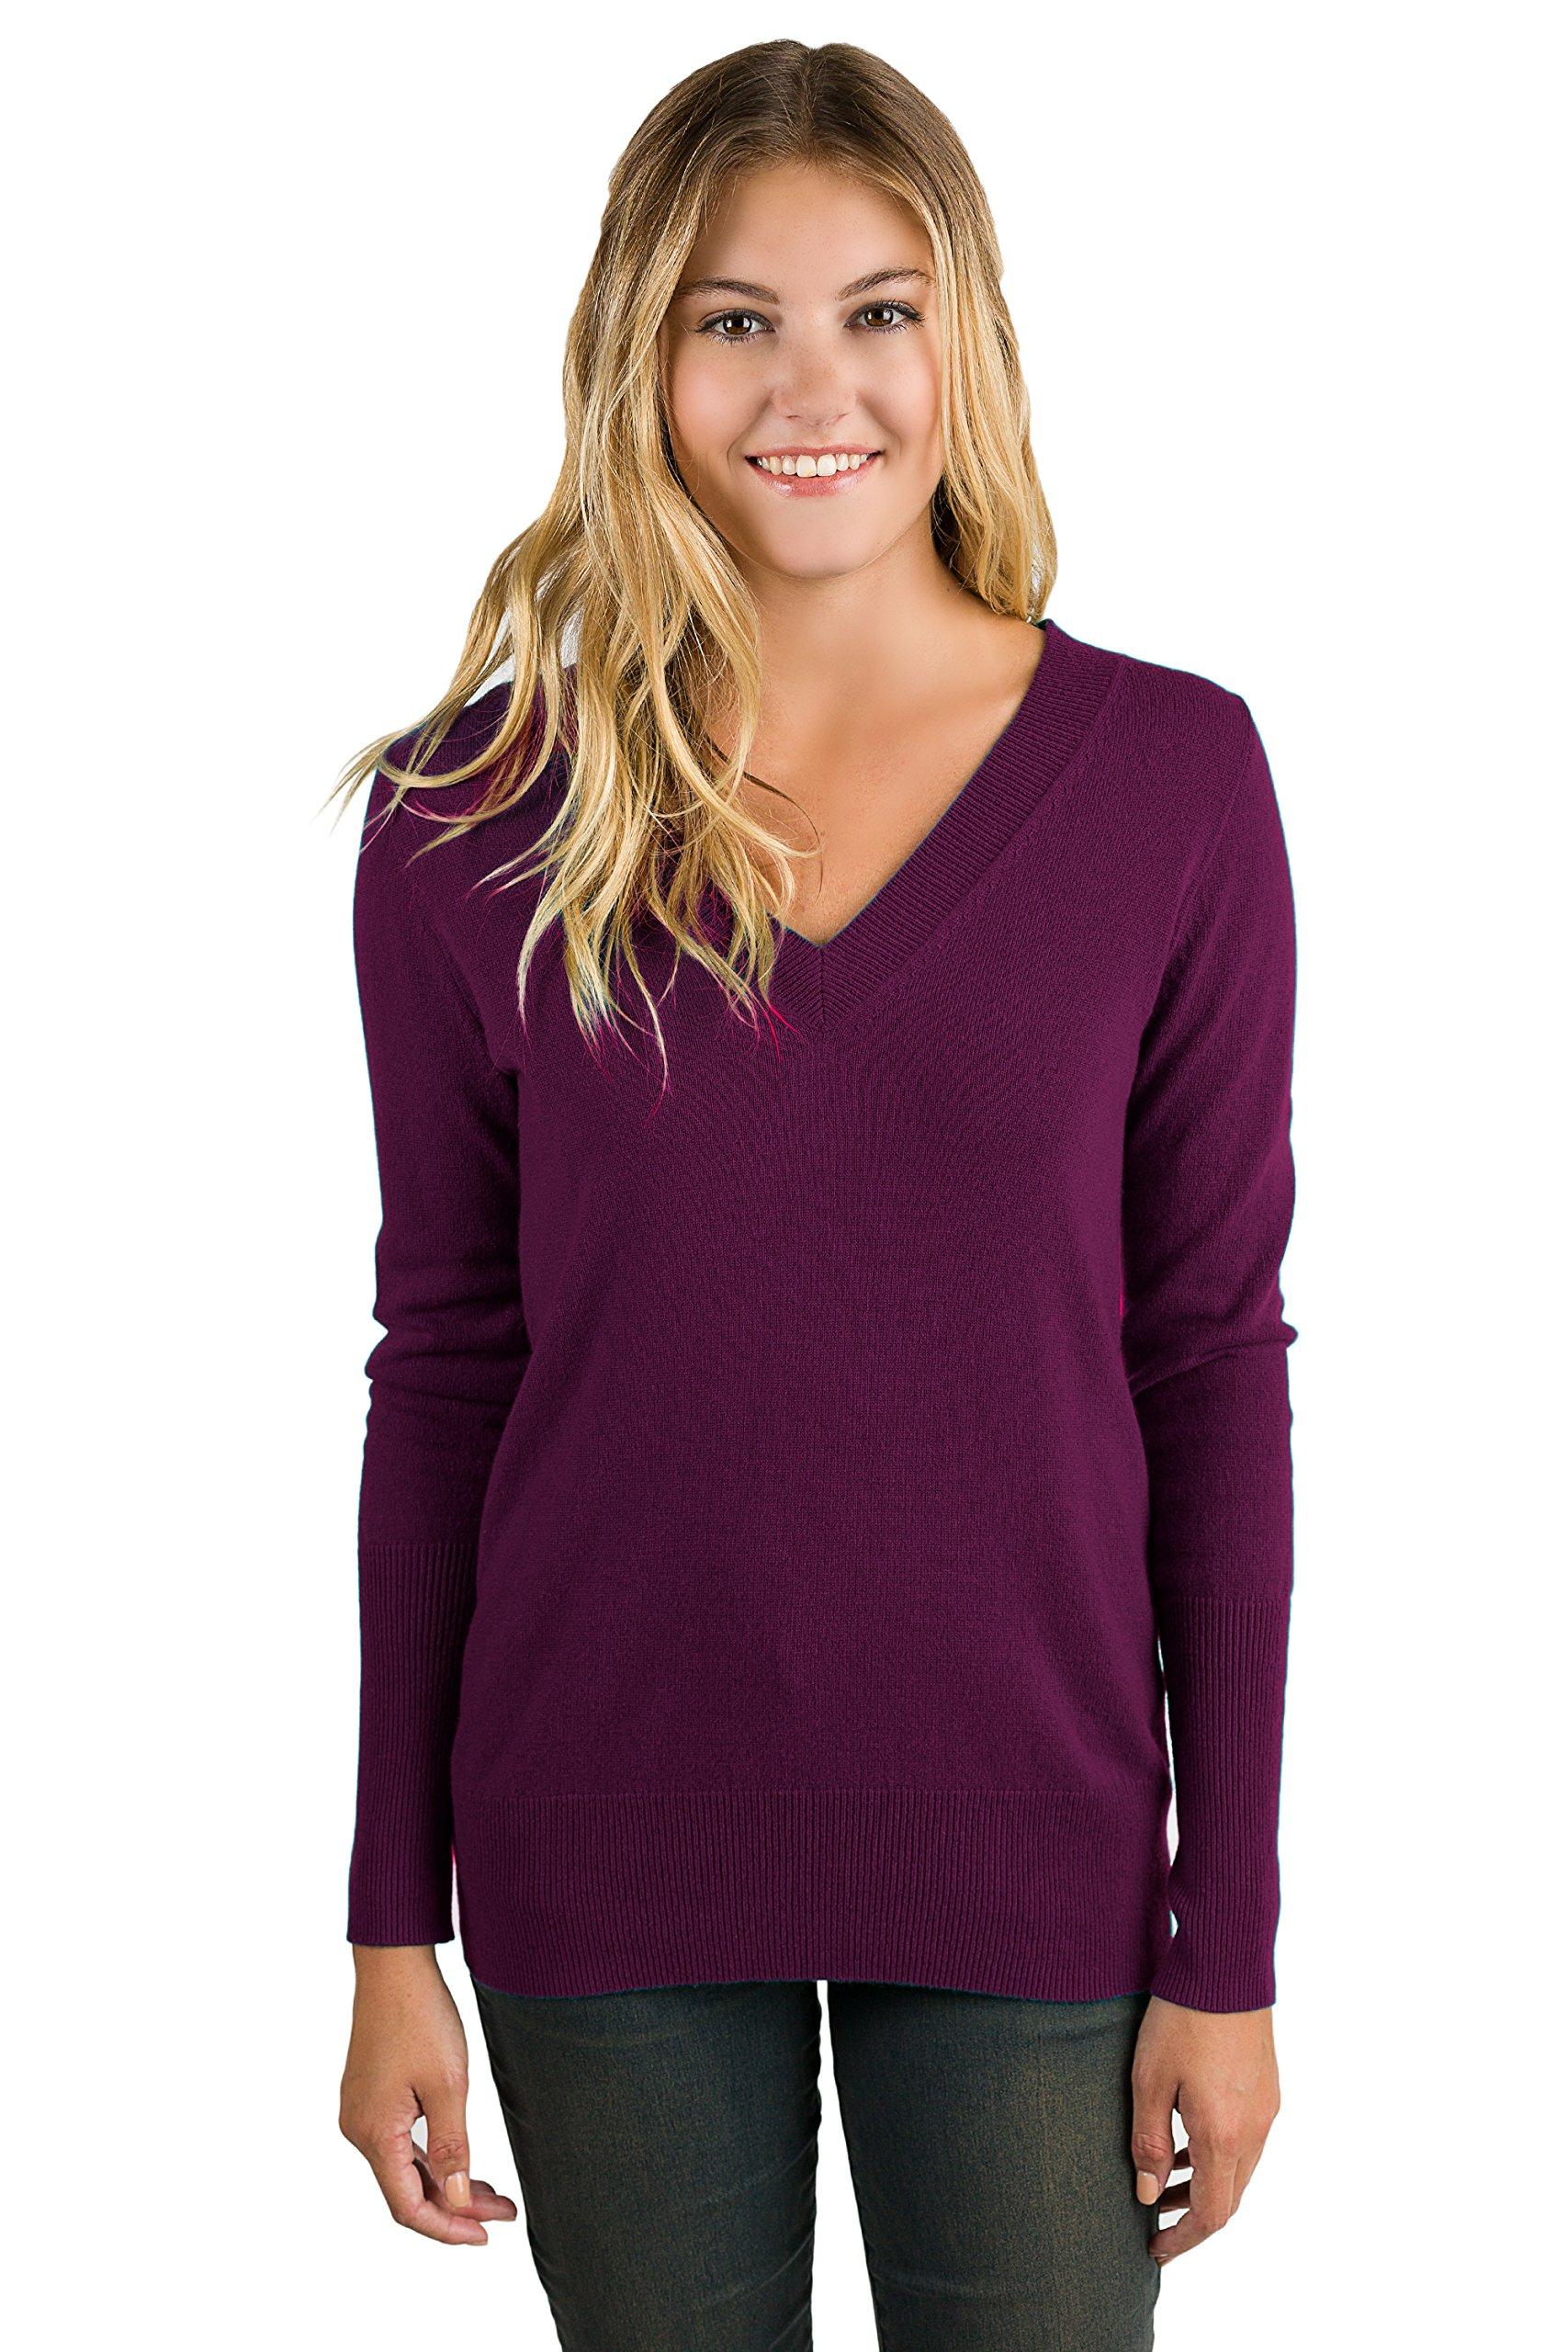 JENNIE LIU Women's 100% Pure Cashmere Long Sleeve Ava V Neck Sweater (M, Plum)